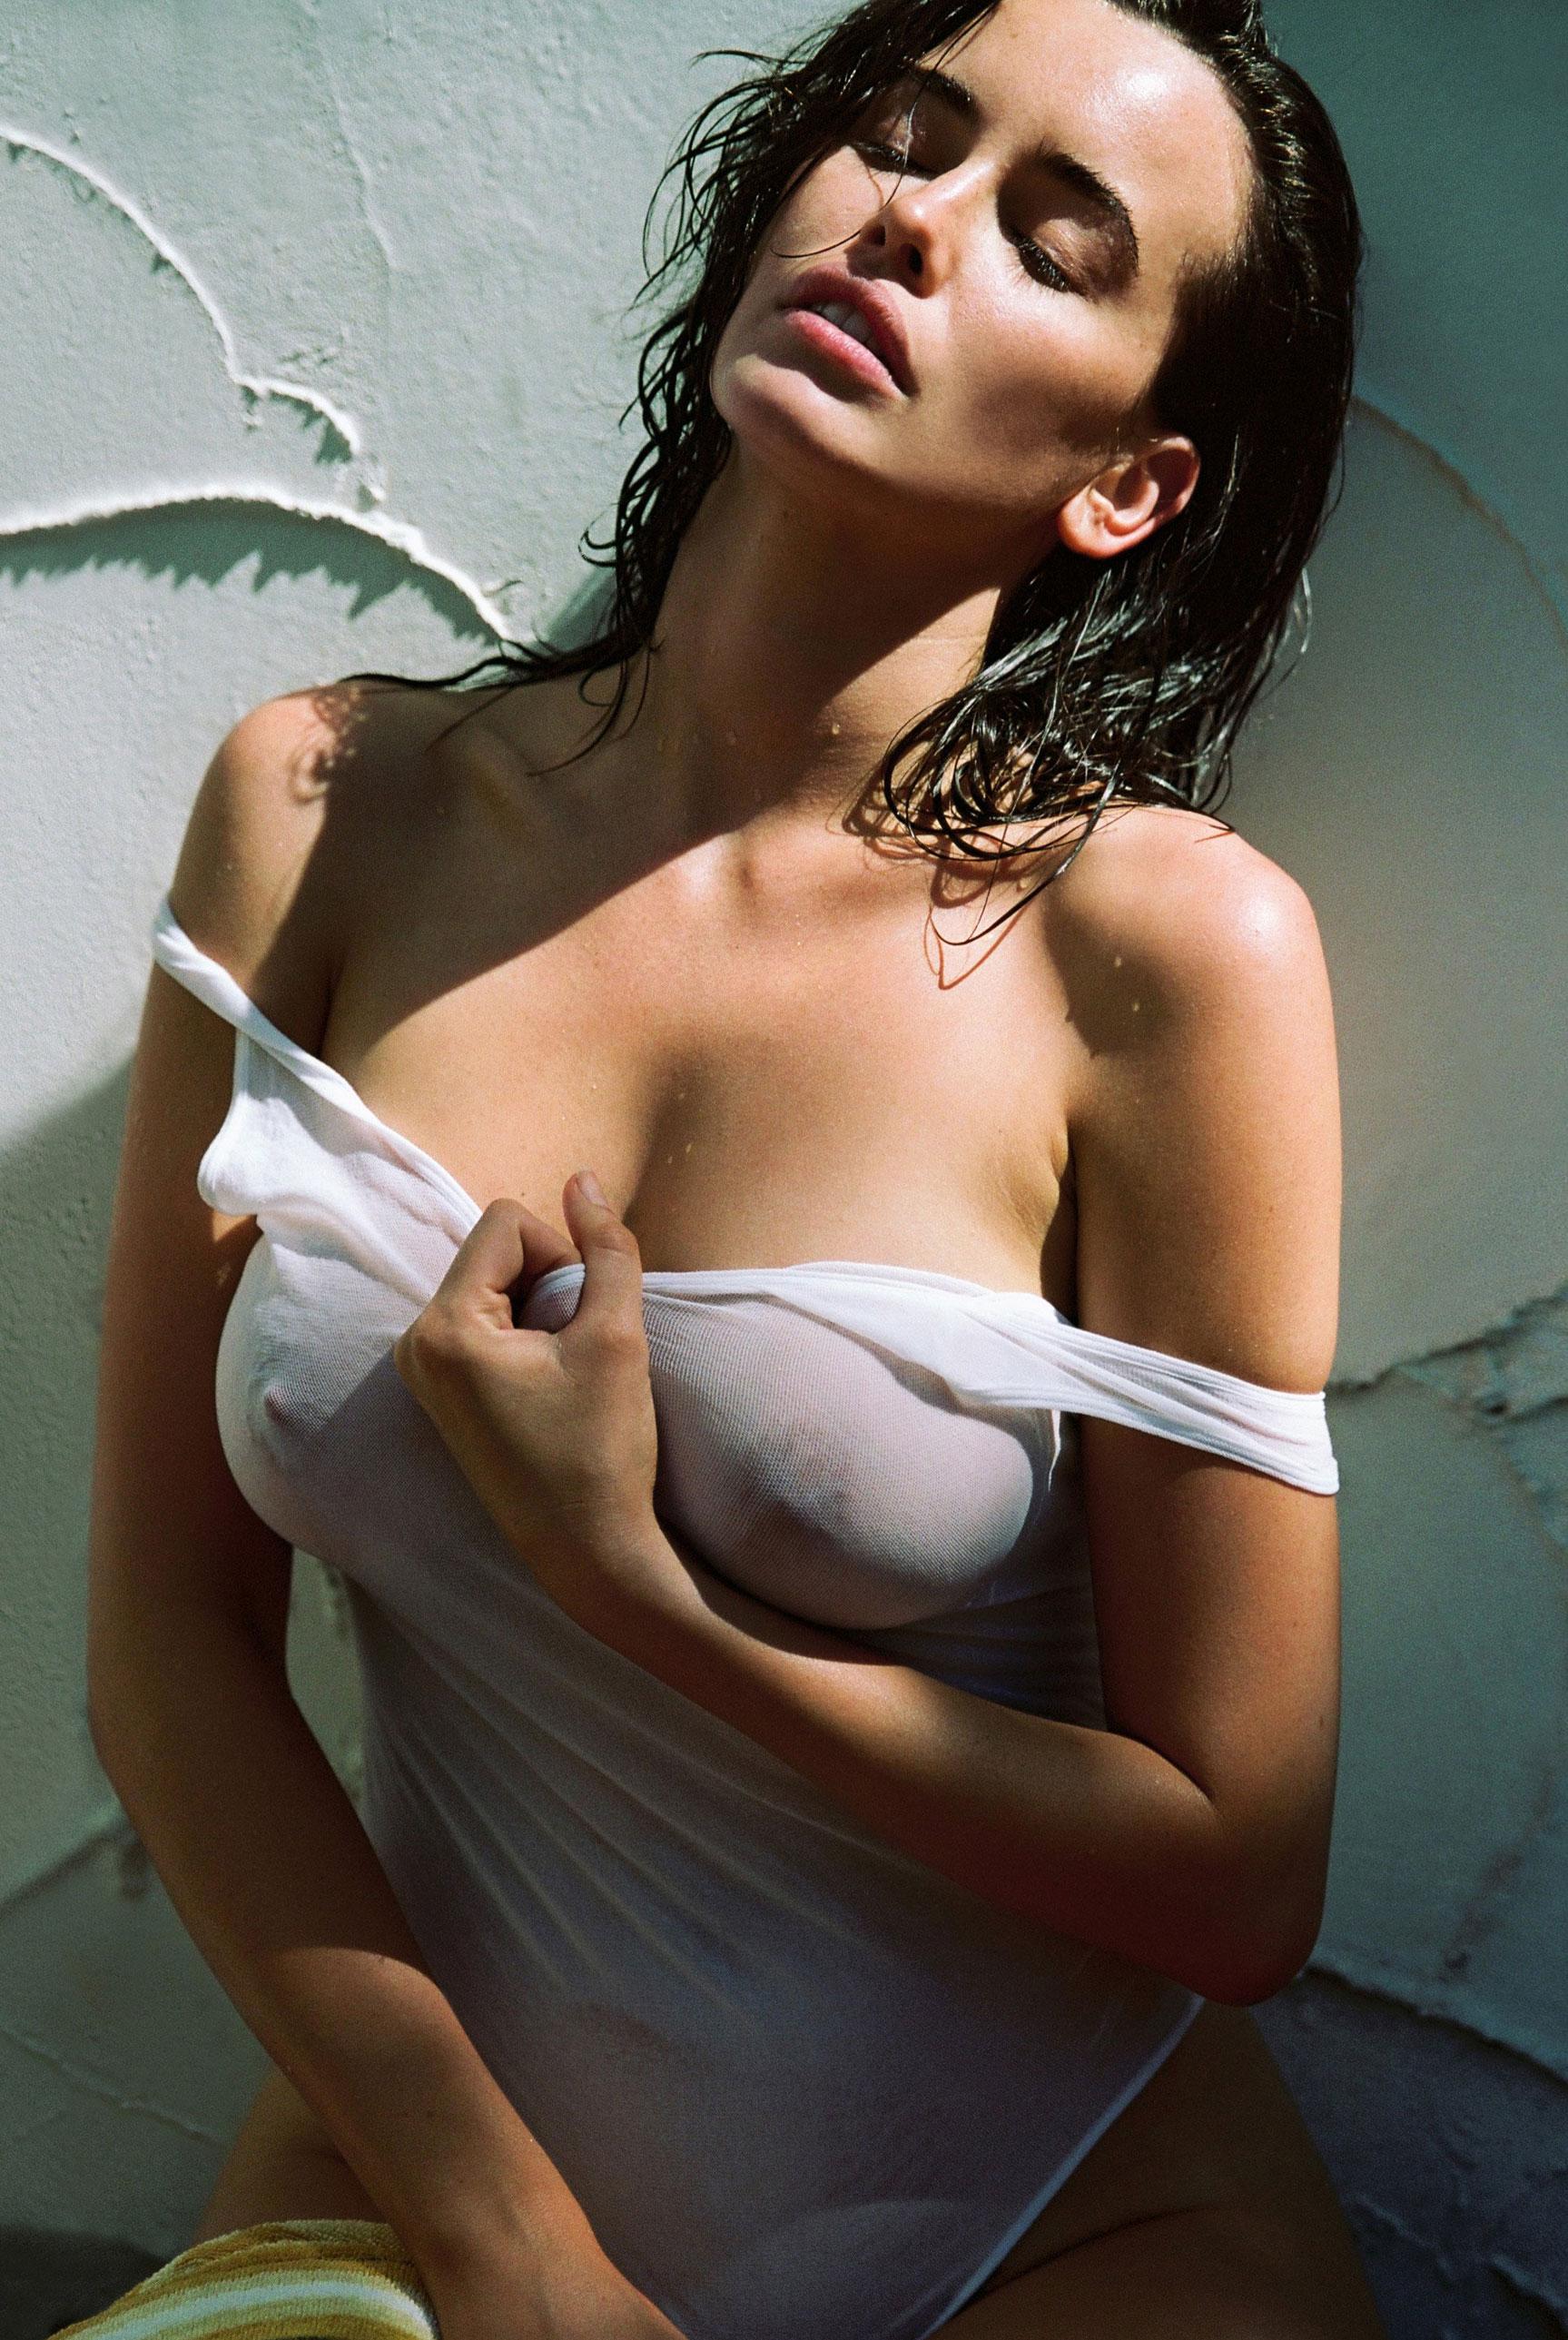 Sun Song / Sarah Stephens nude by Cameron Hammond - Playboy july/august 2018